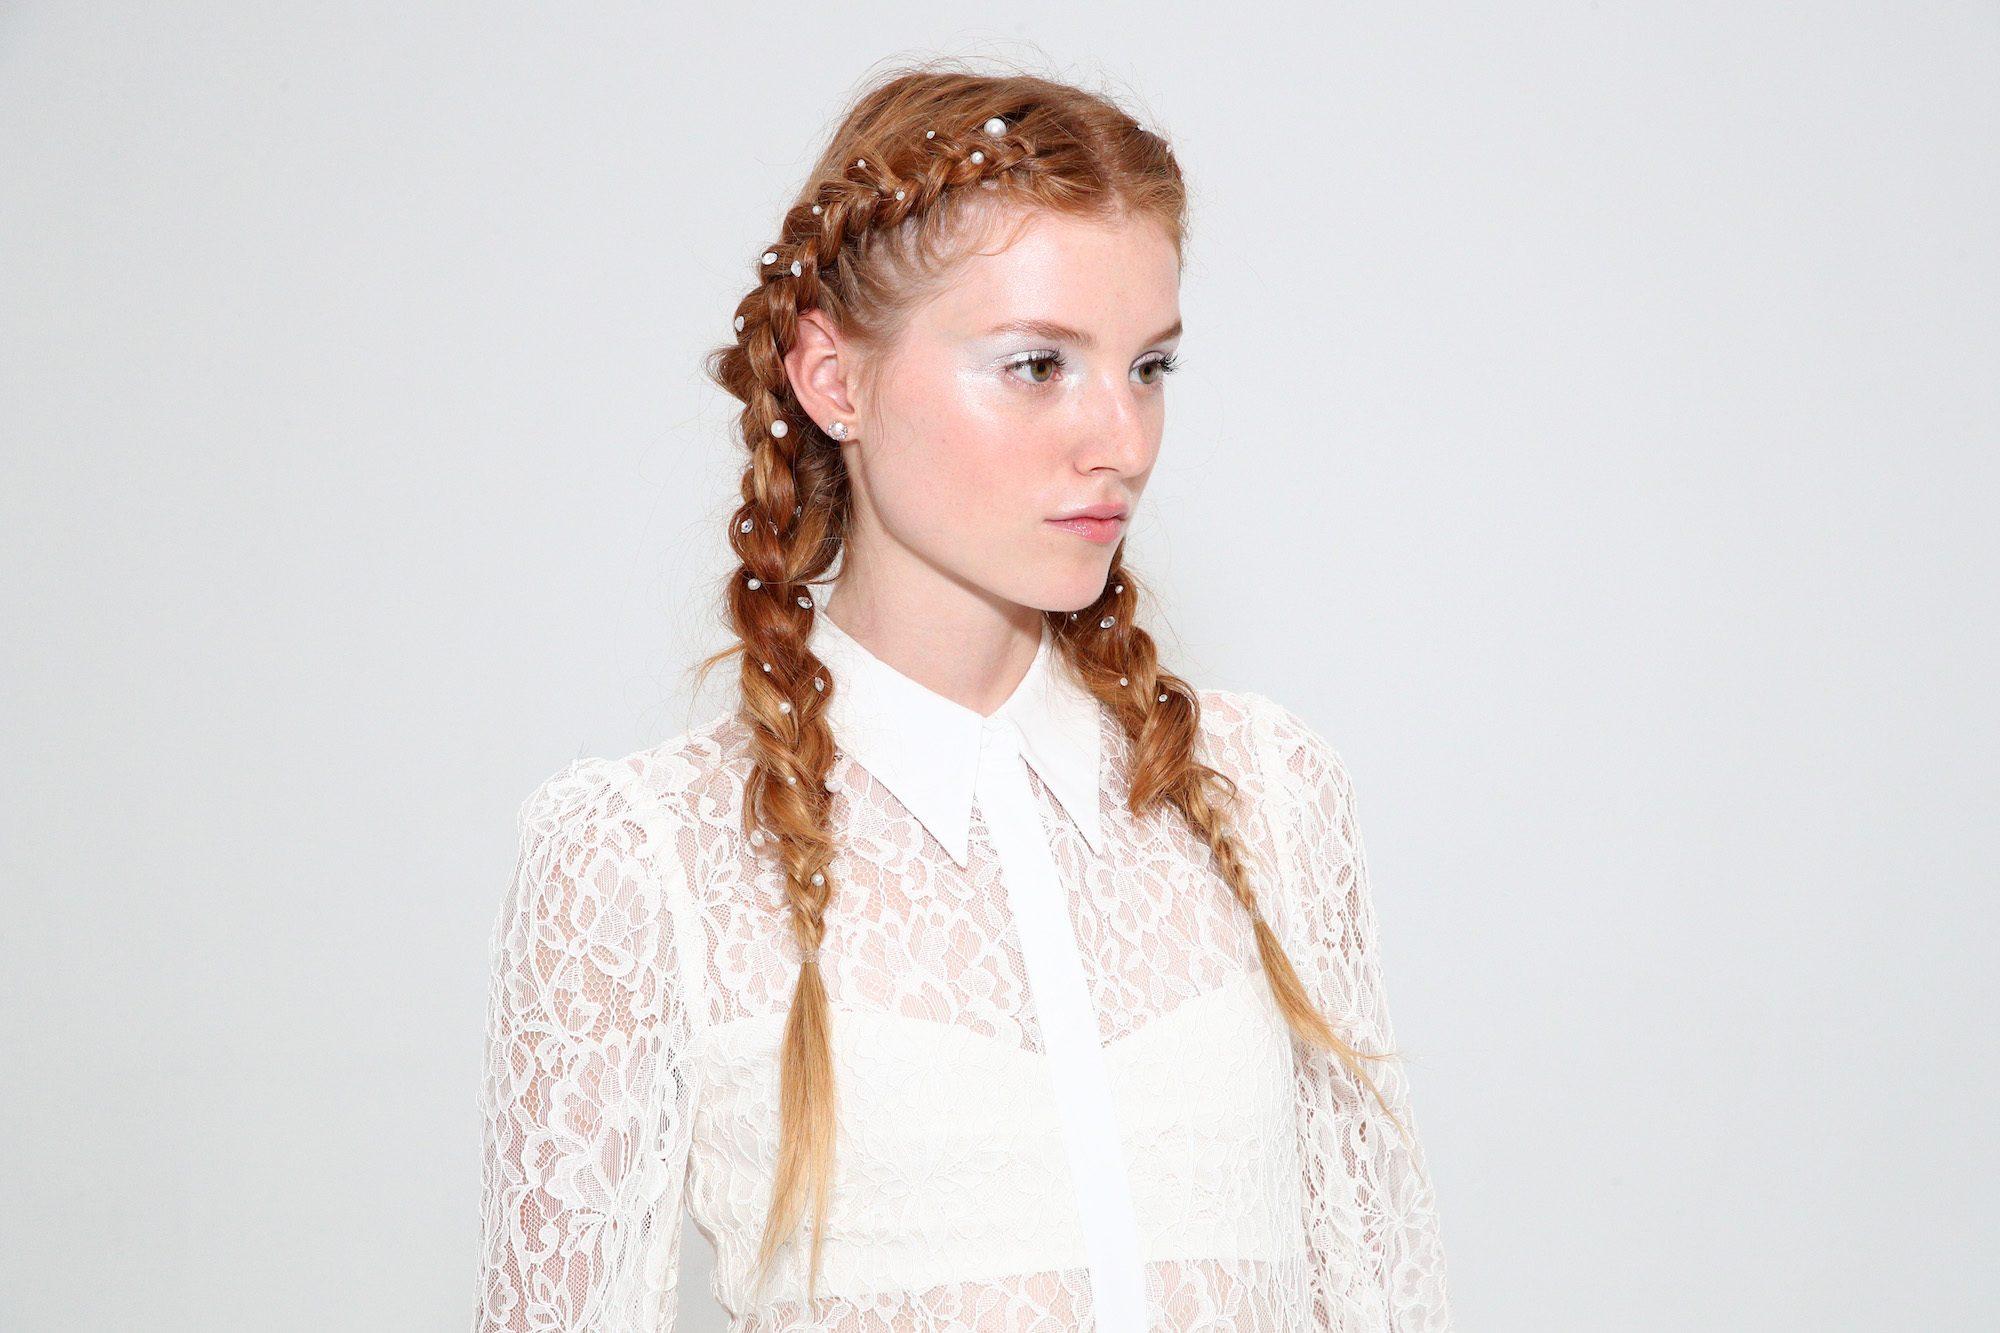 Gaya rambut kepang dutch dengan pearl warna rambut pirang